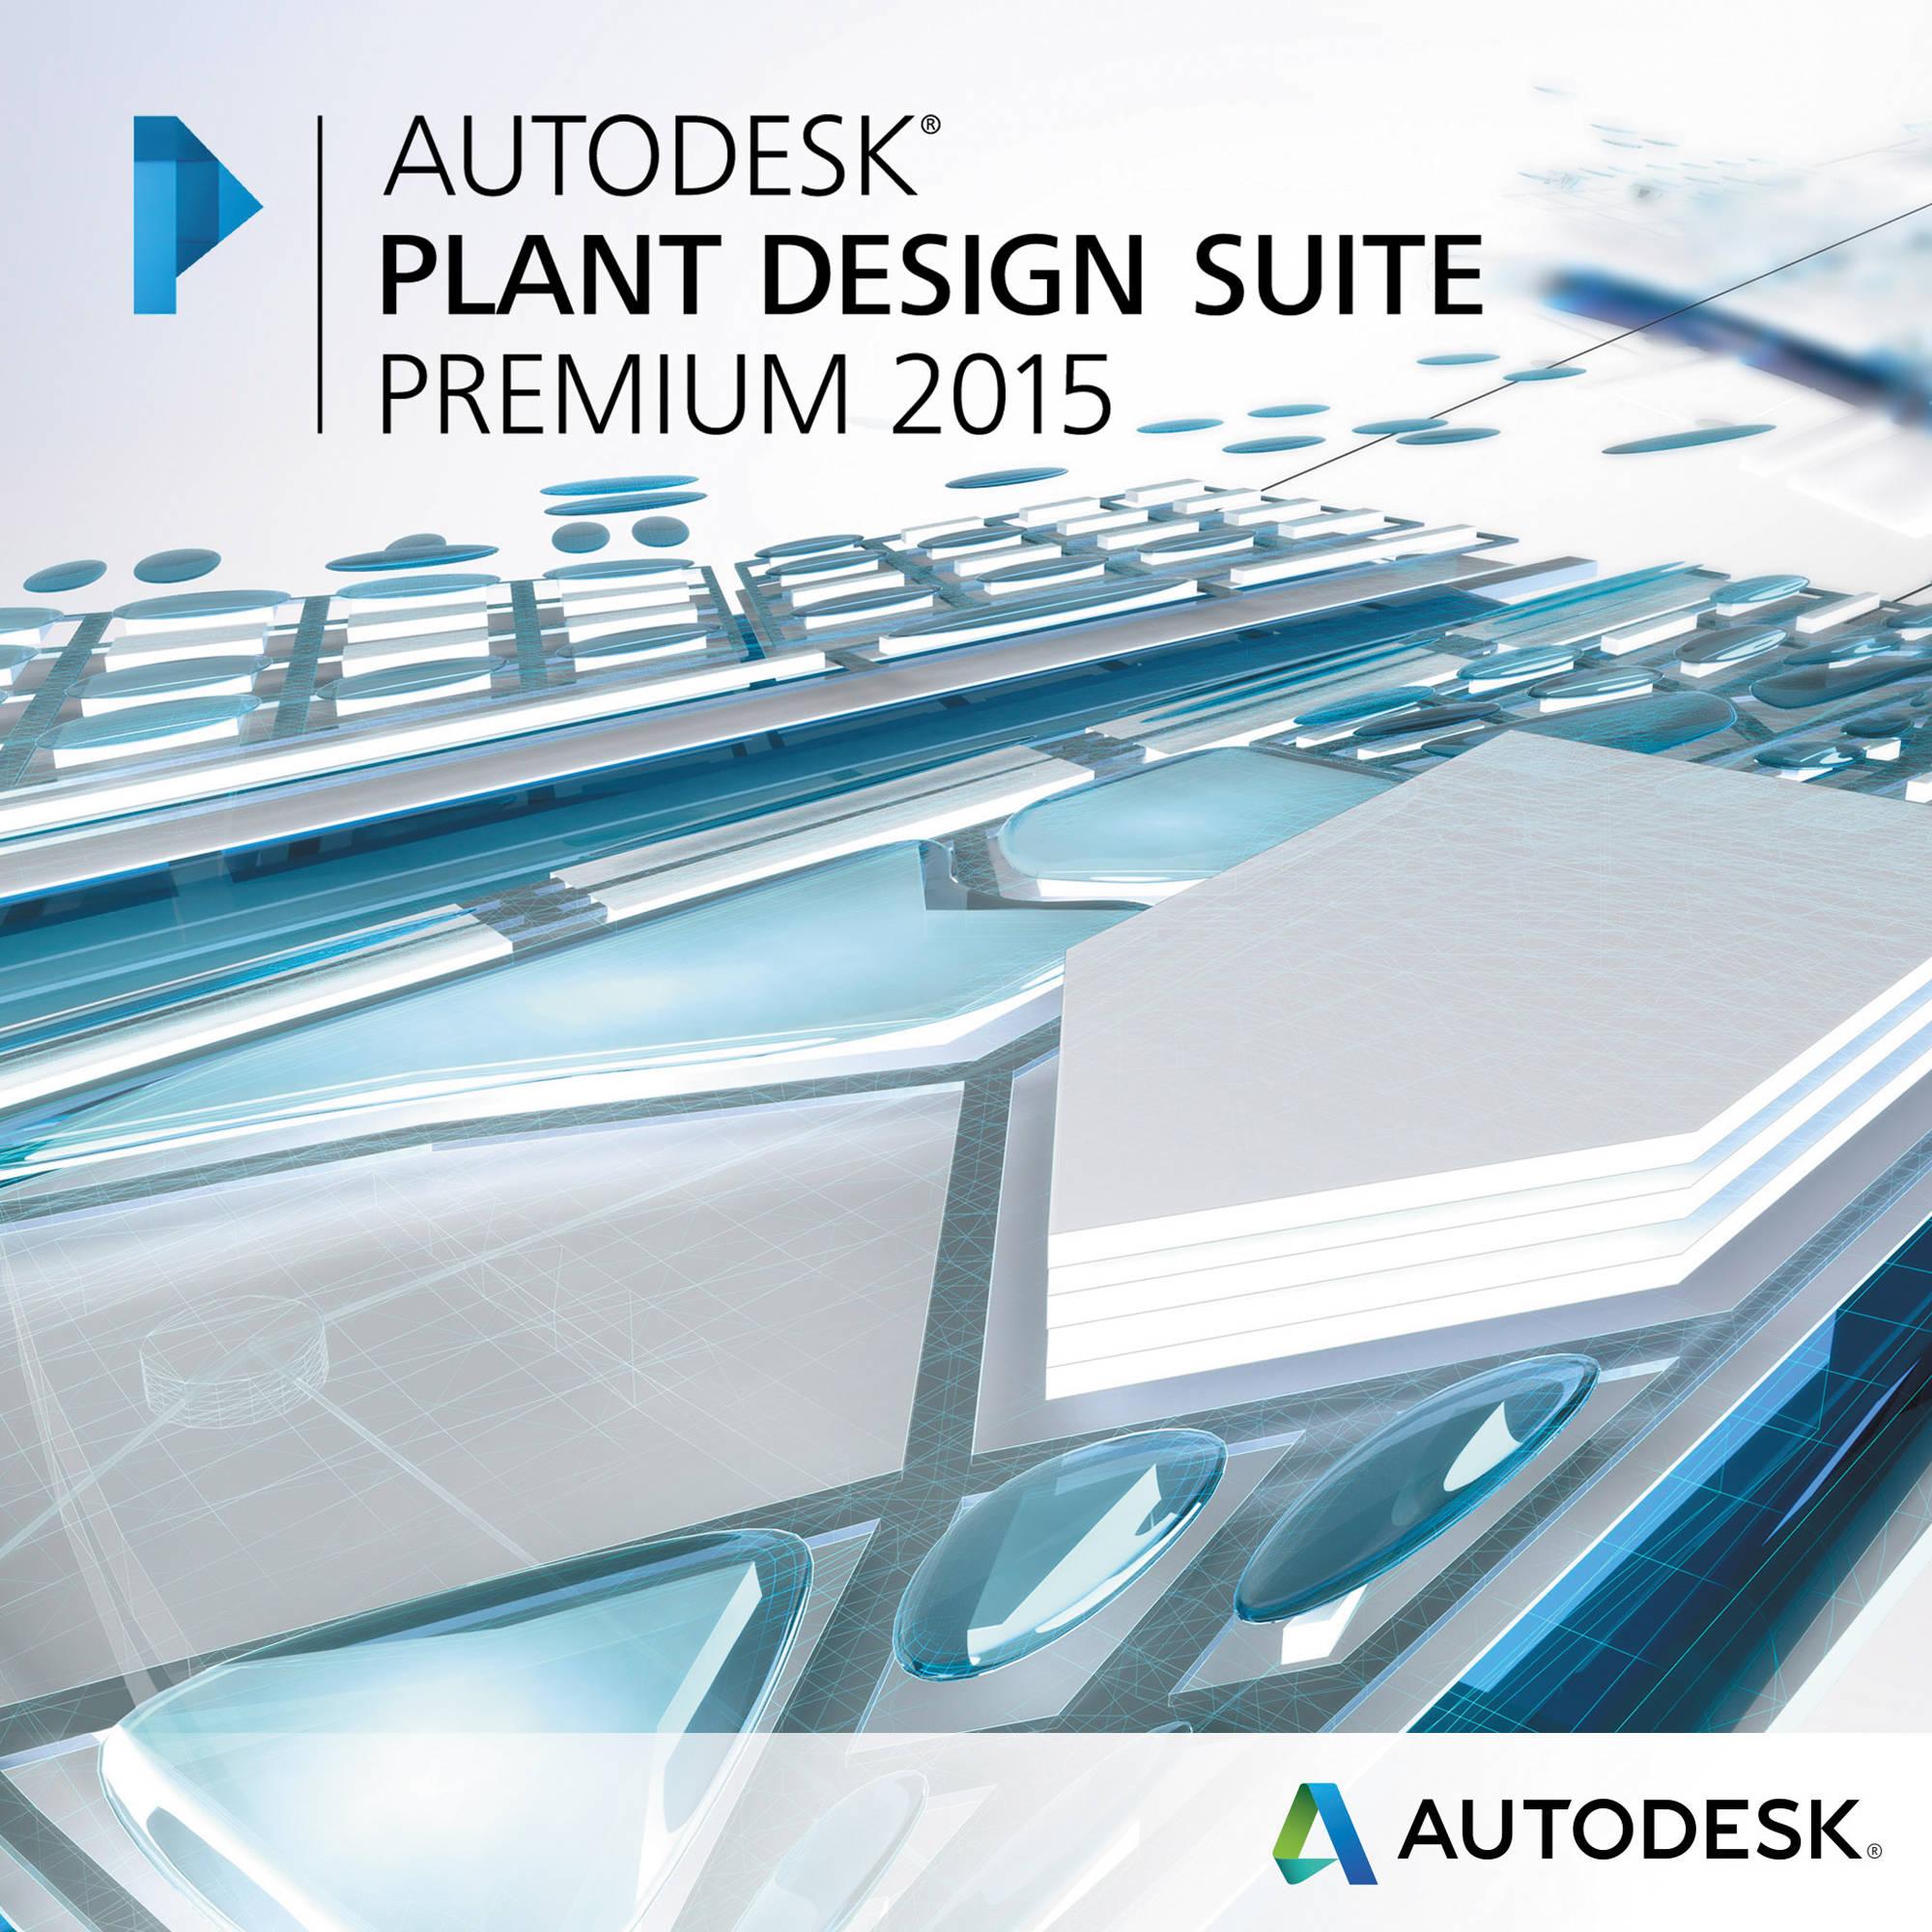 Buy Autodesk Plant Design Suite Ultimate 2015 code